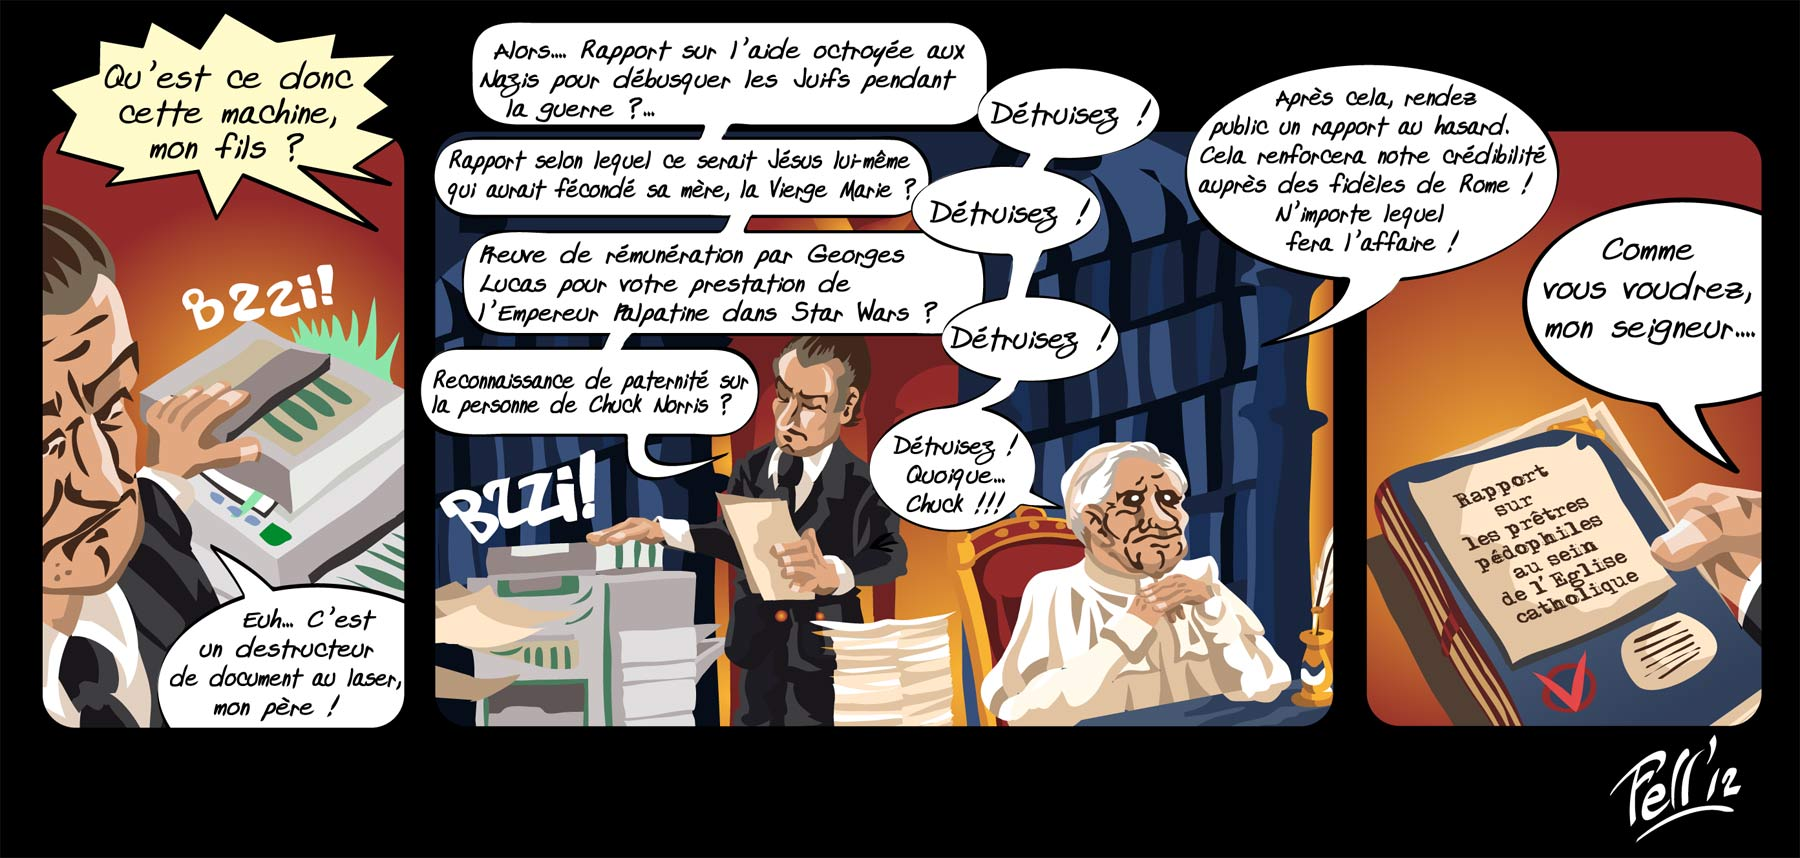 Benoît XVI et son majordome